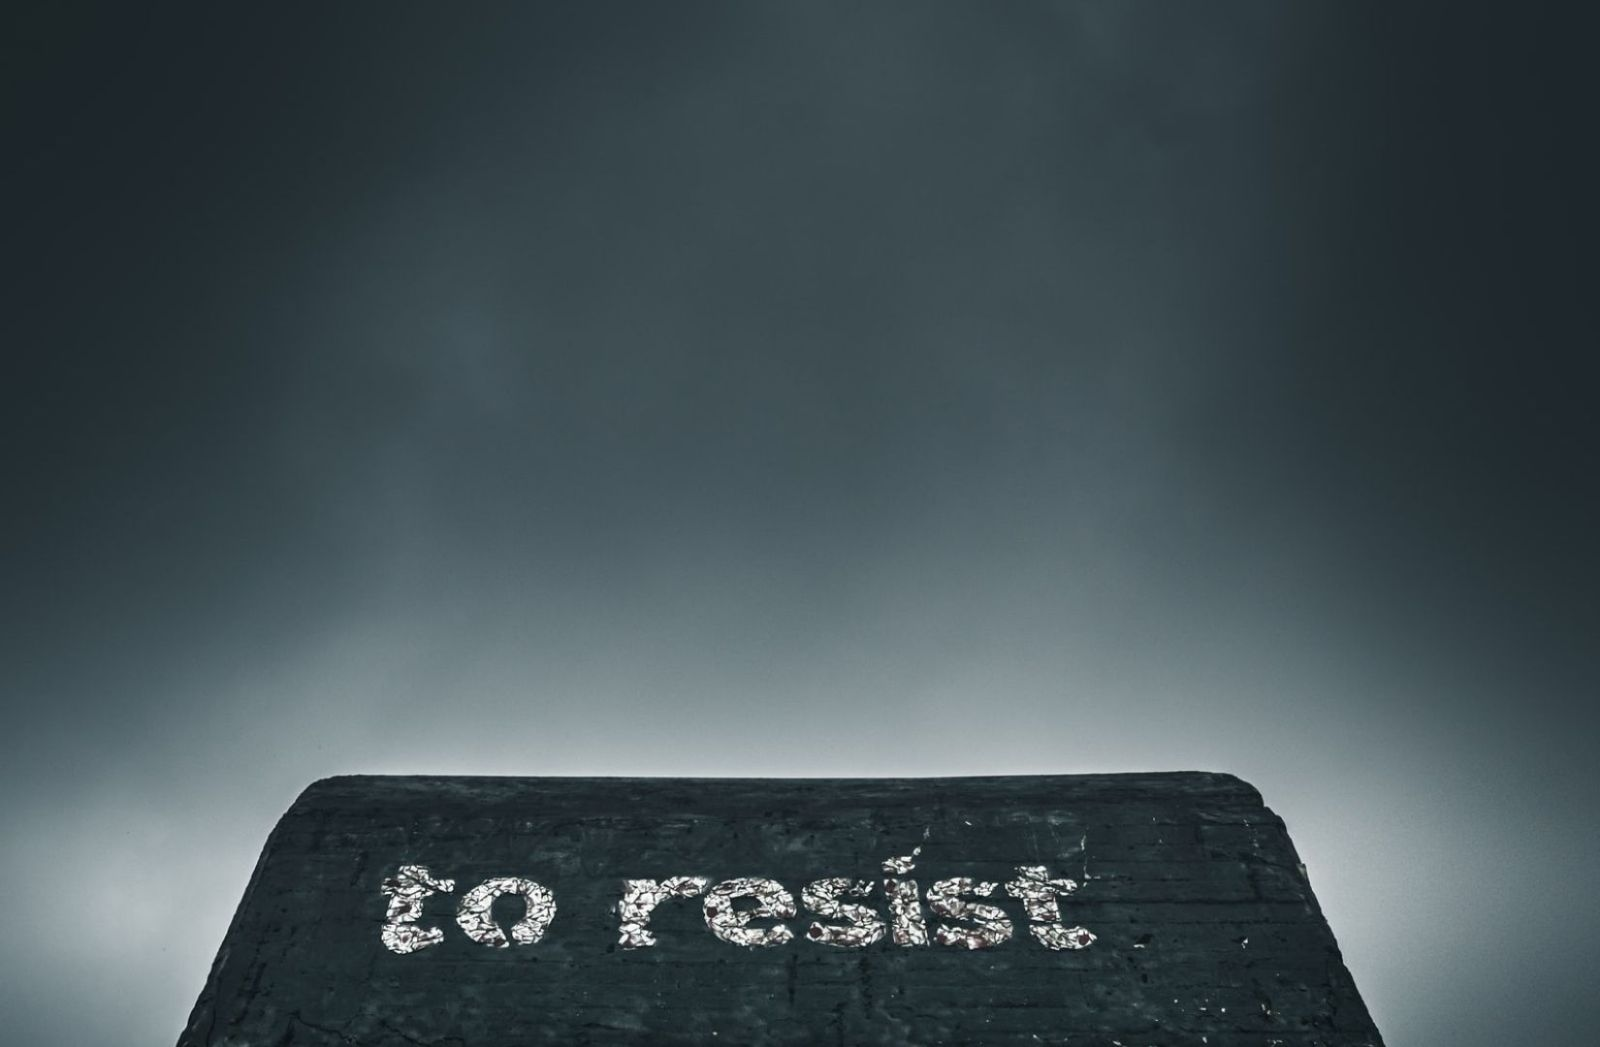 Widerstand leisten. (Foto: Alexandre Dinaut, Unsplash.com)